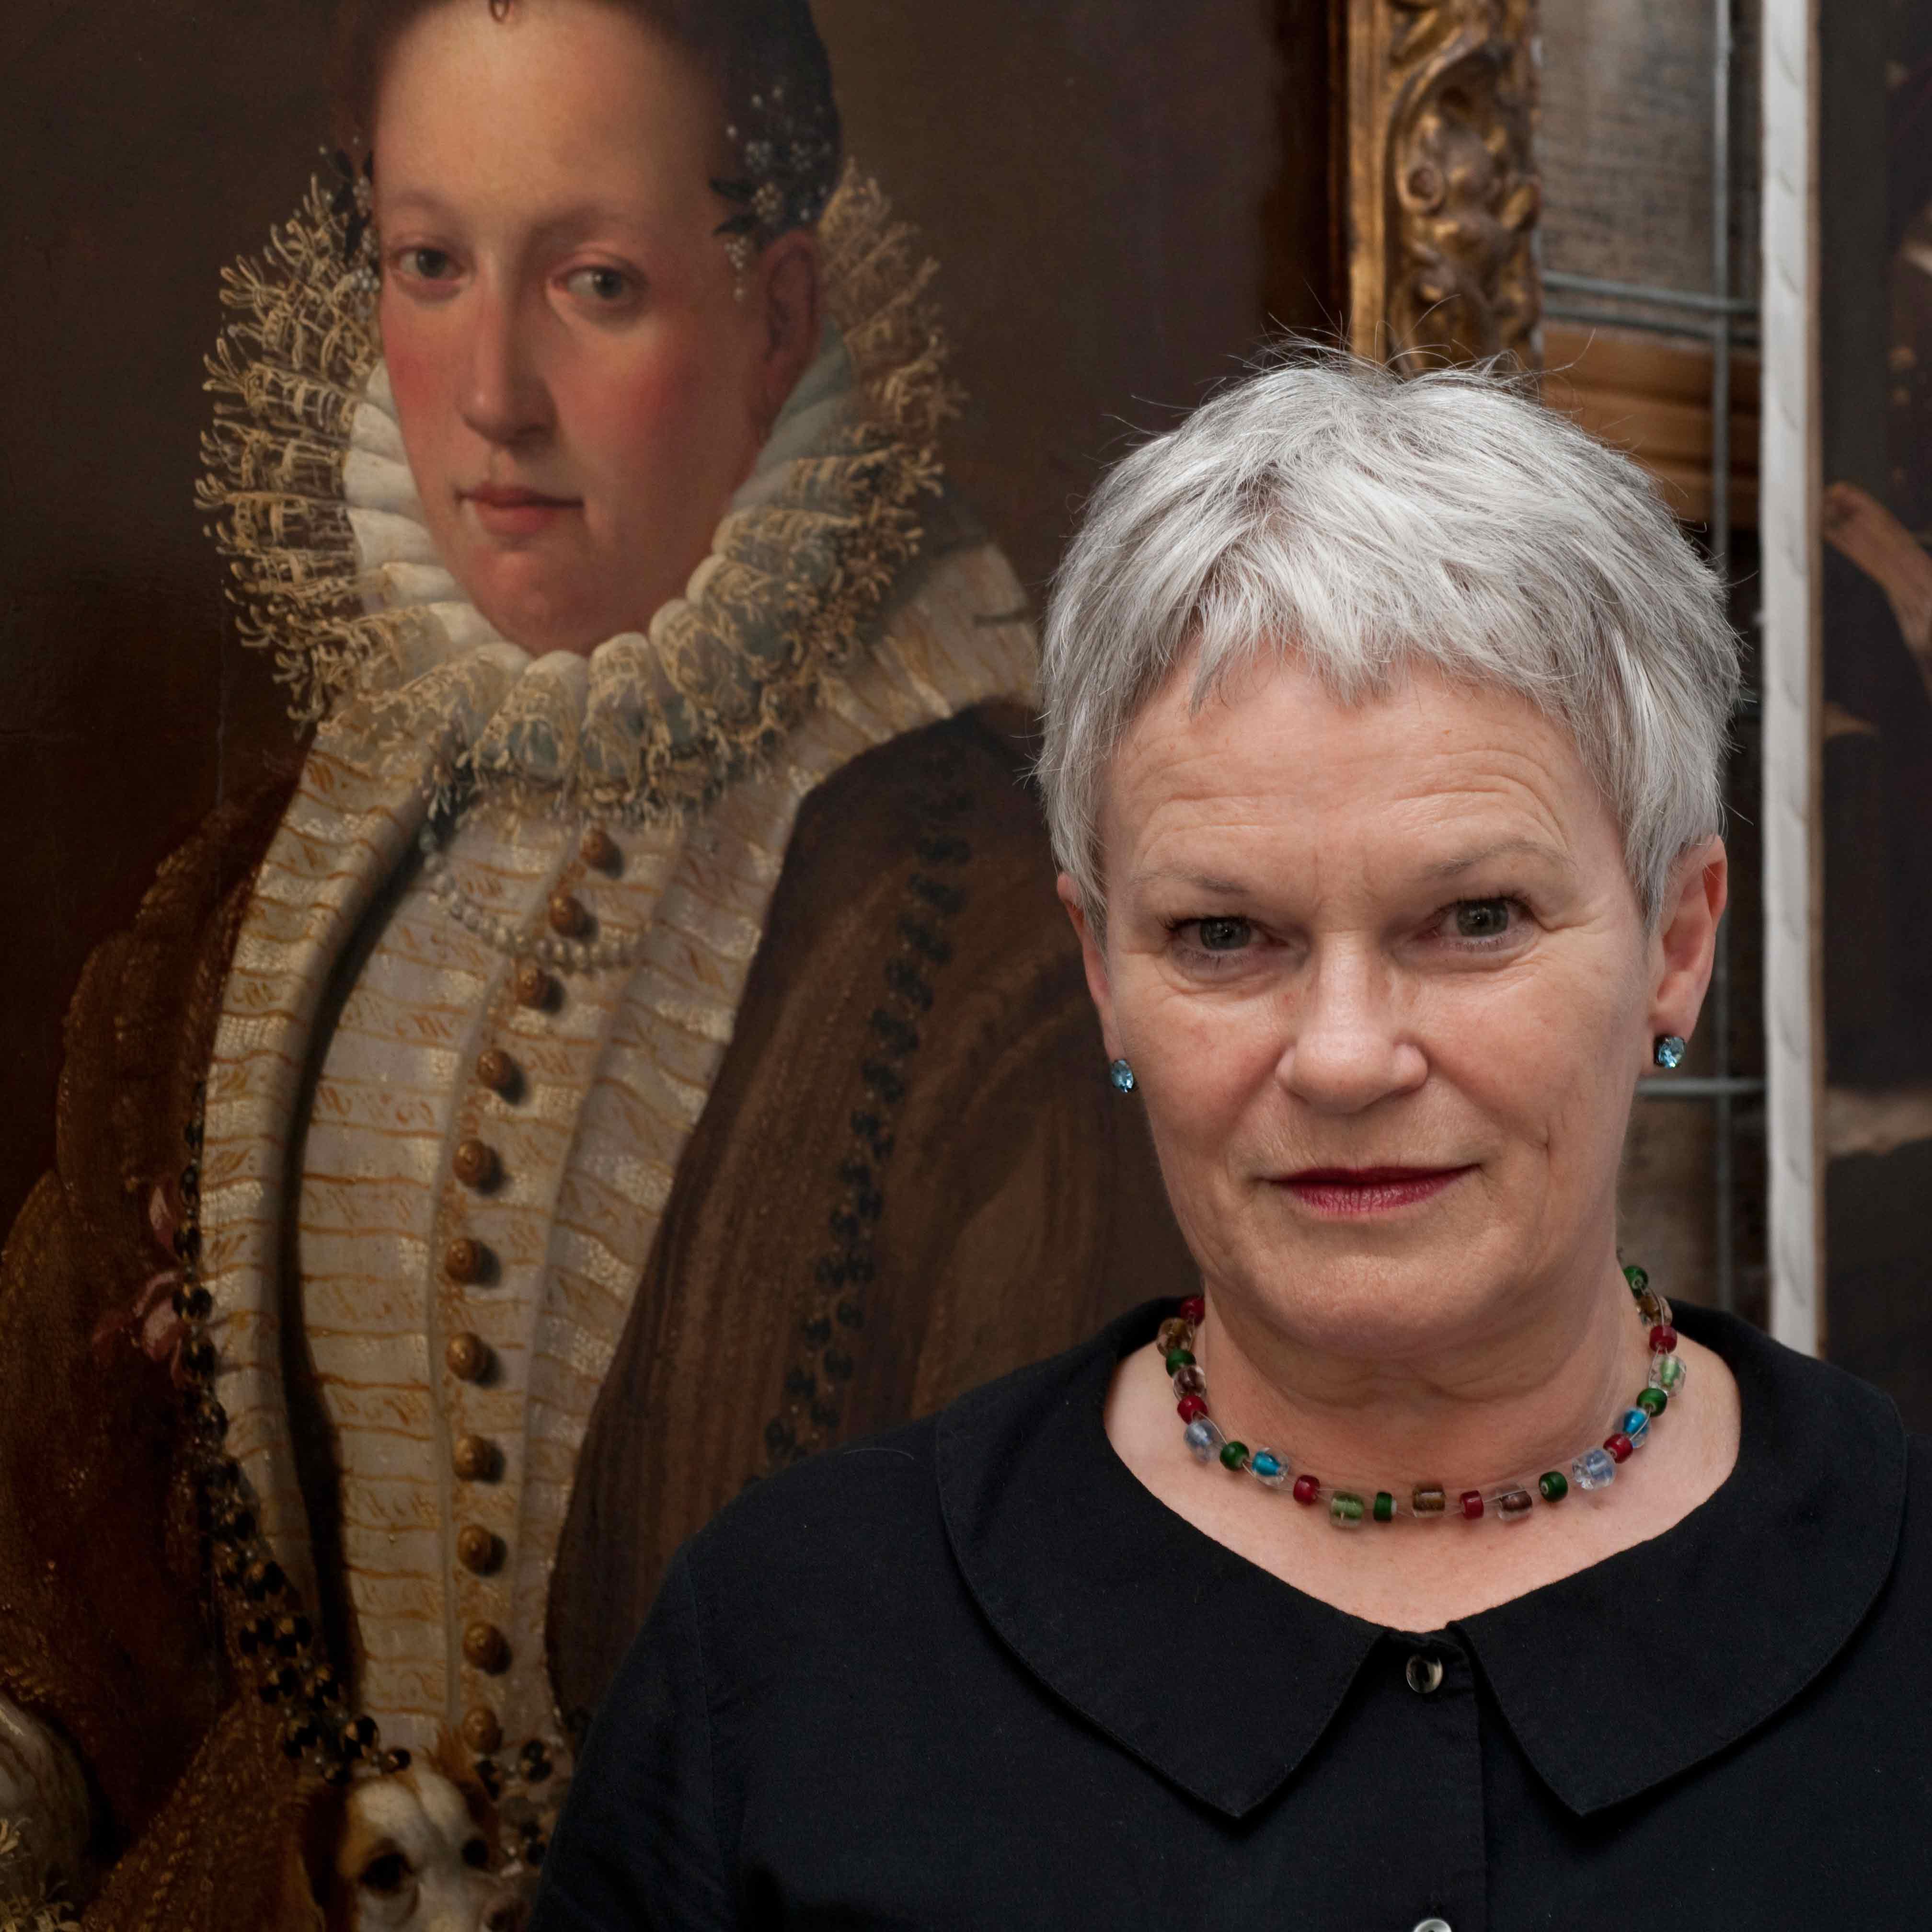 The artist in her studio: Frances Hodgkins & Gretchen Albrecht with Mary Kisler